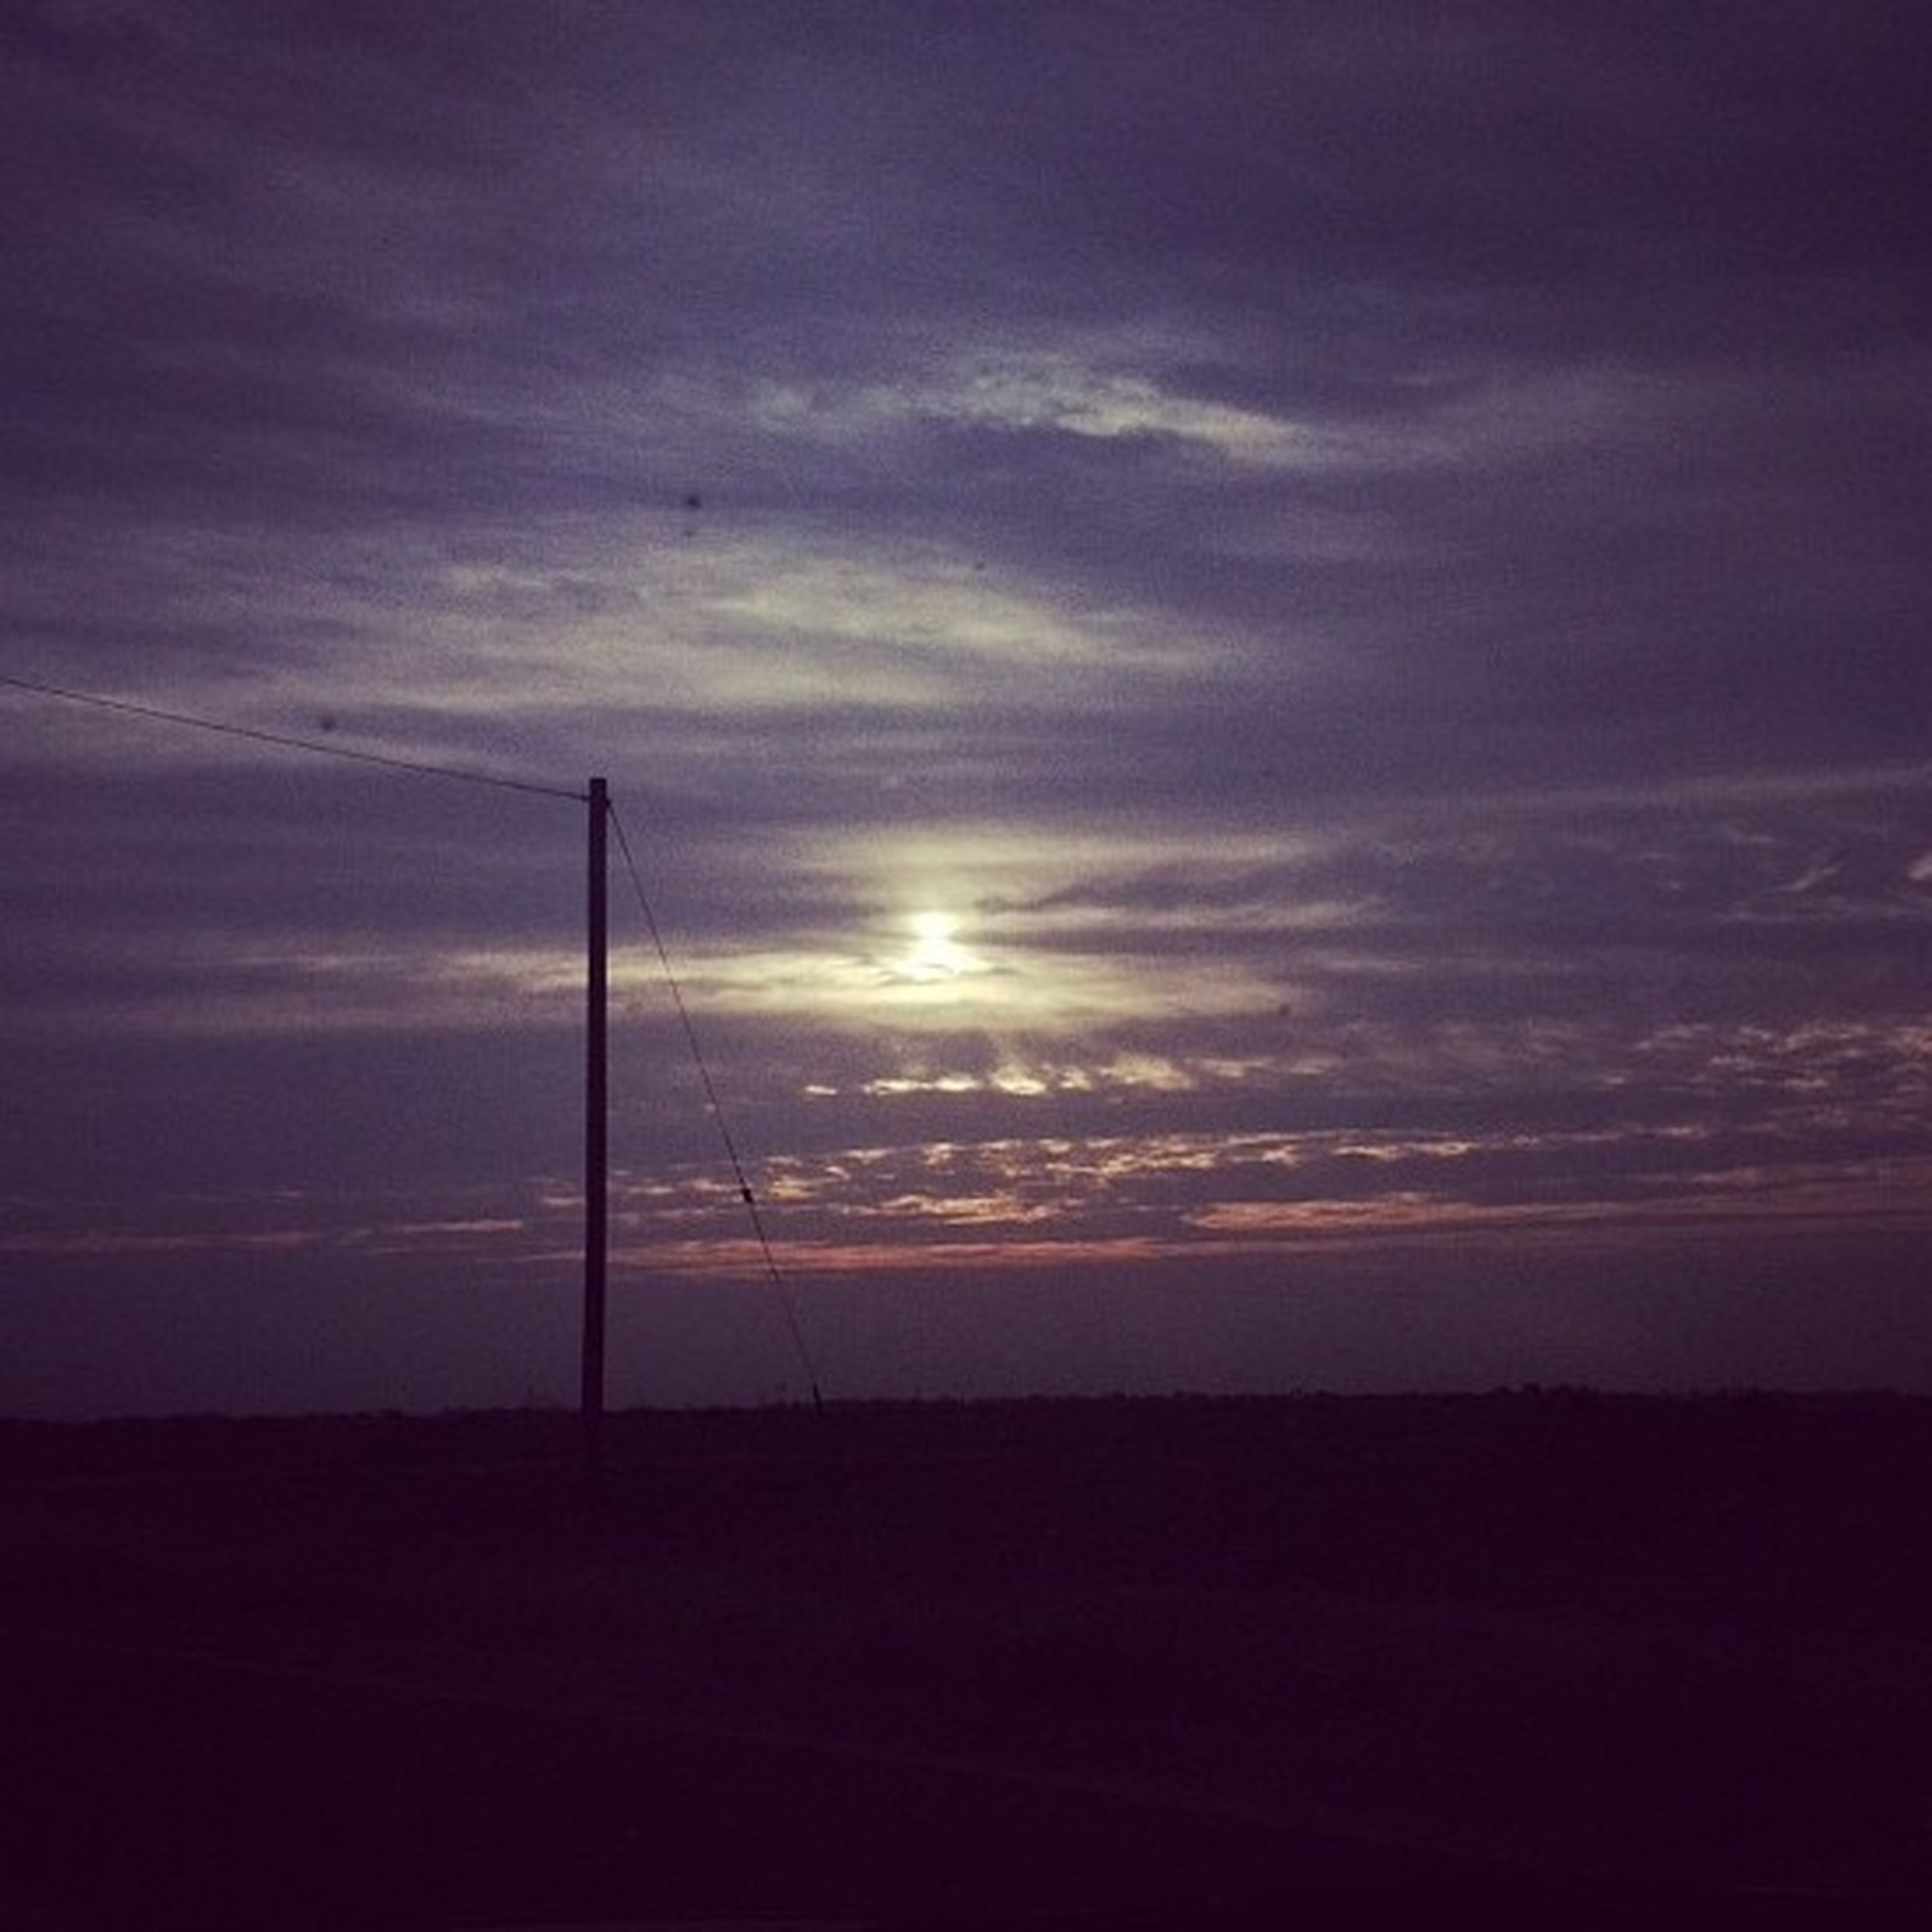 sunset, silhouette, sky, tranquility, scenics, tranquil scene, landscape, beauty in nature, sun, cloud - sky, nature, orange color, field, idyllic, cloud, outdoors, dark, horizon over land, cloudy, dusk